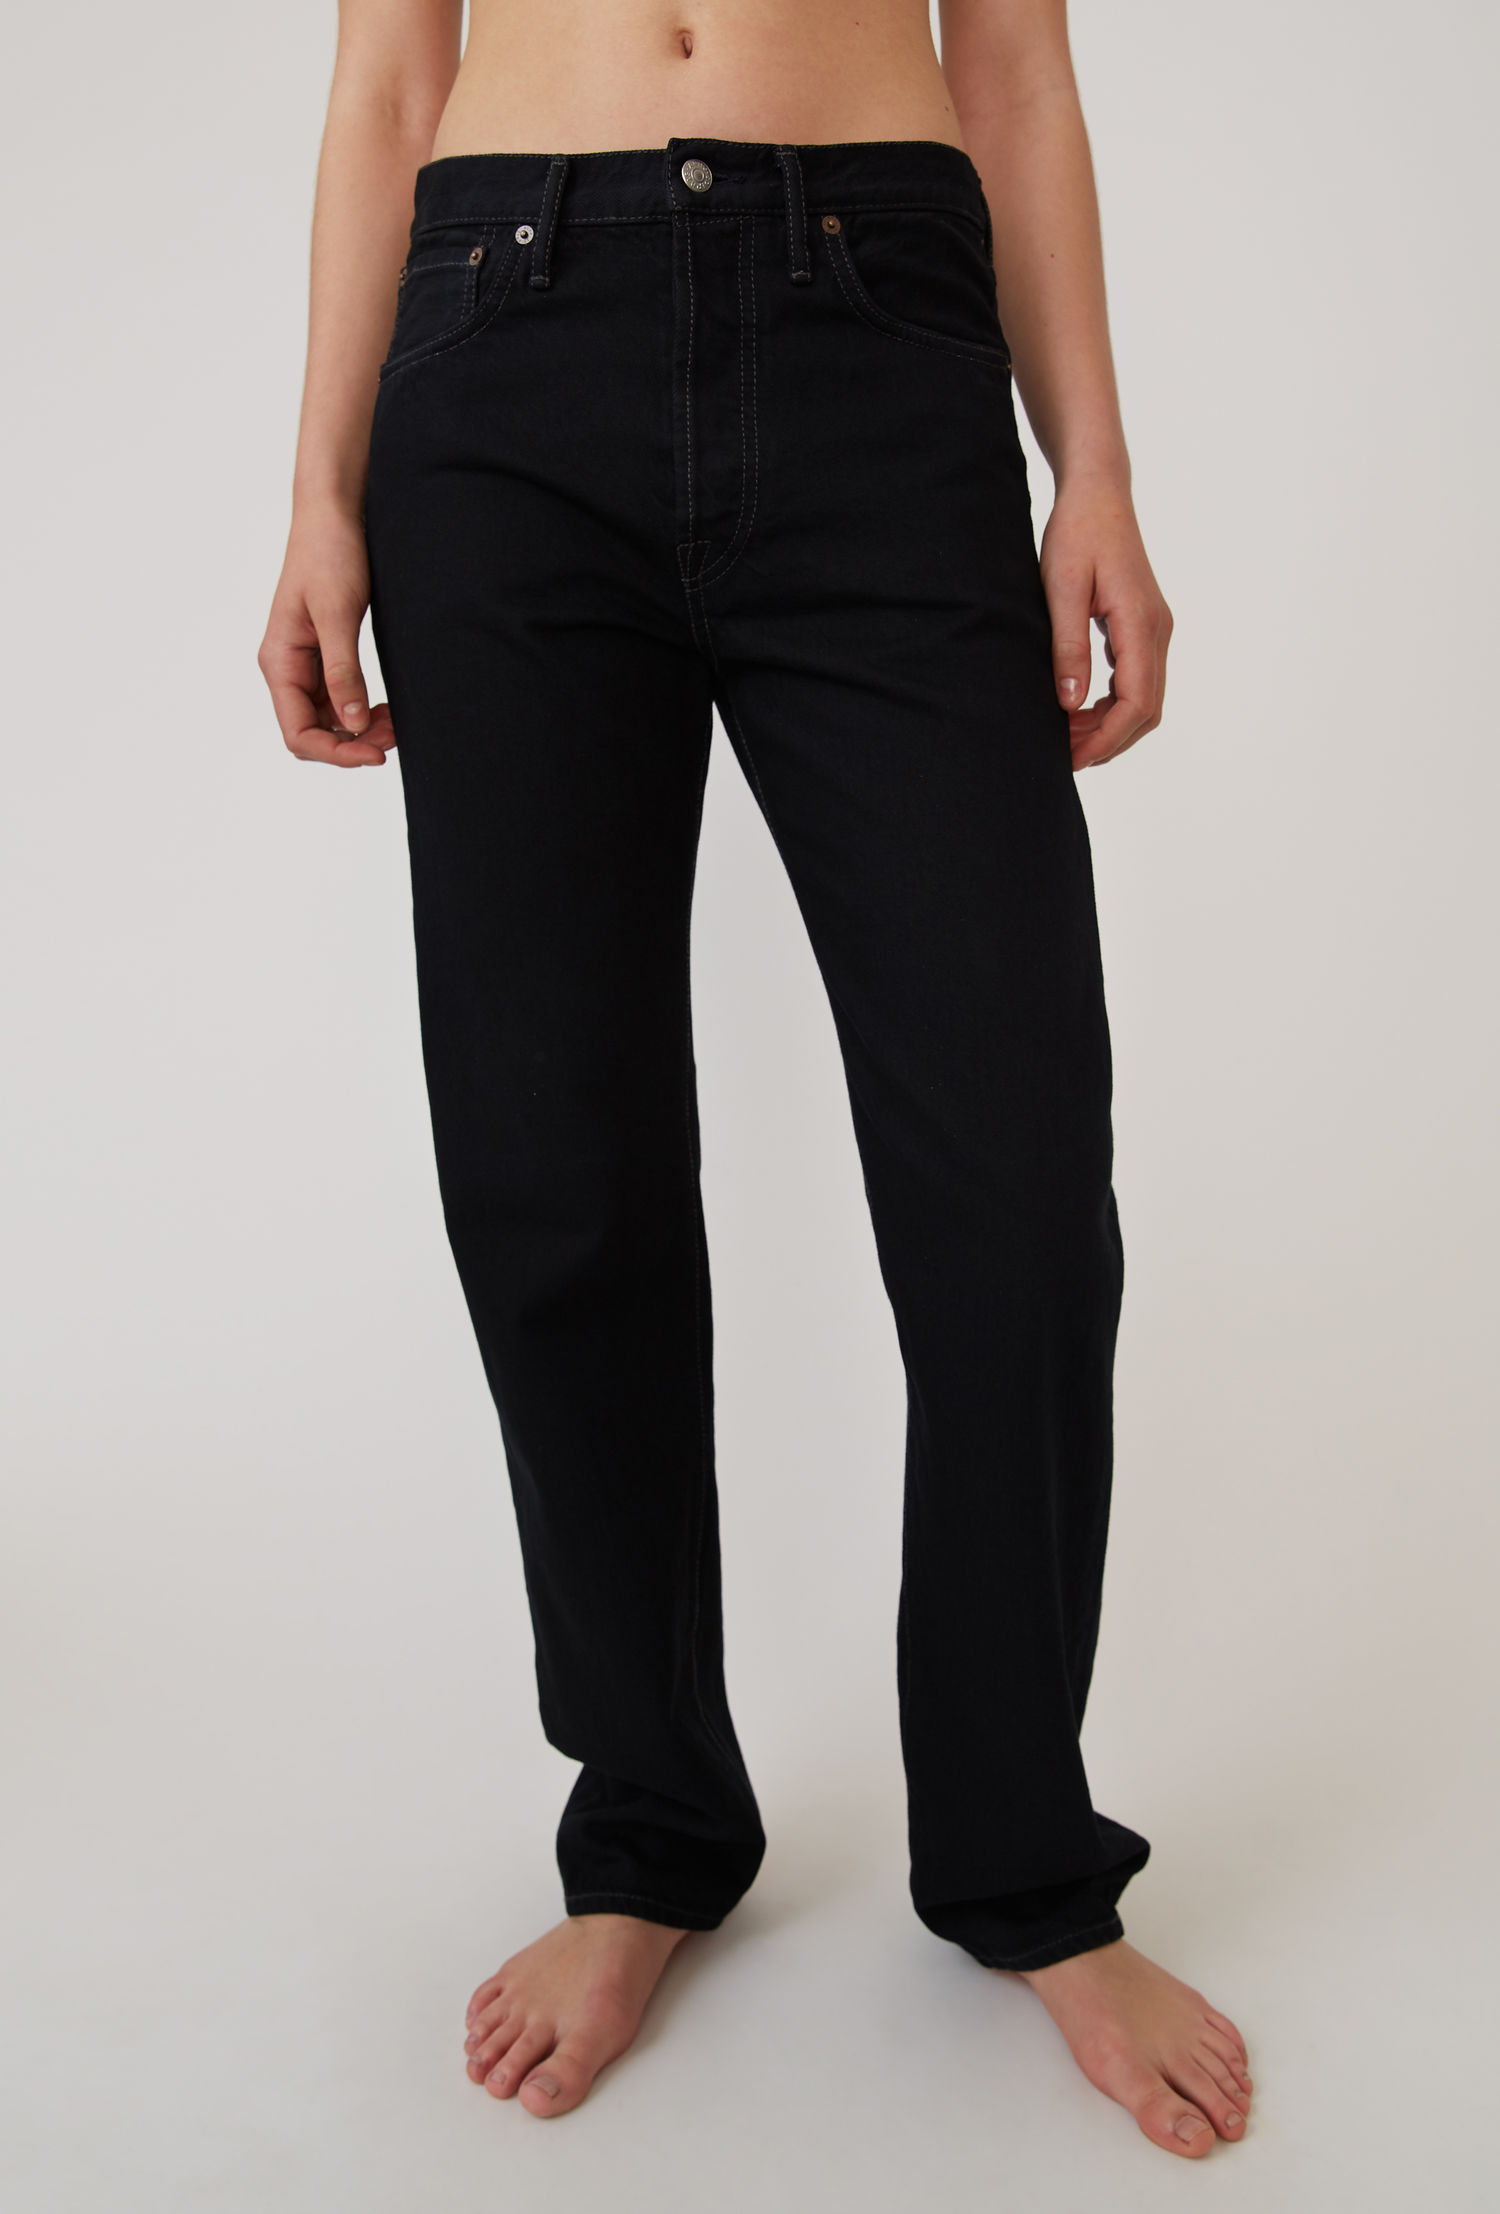 acne_studios_Classic_fit_jeans_black.jpg